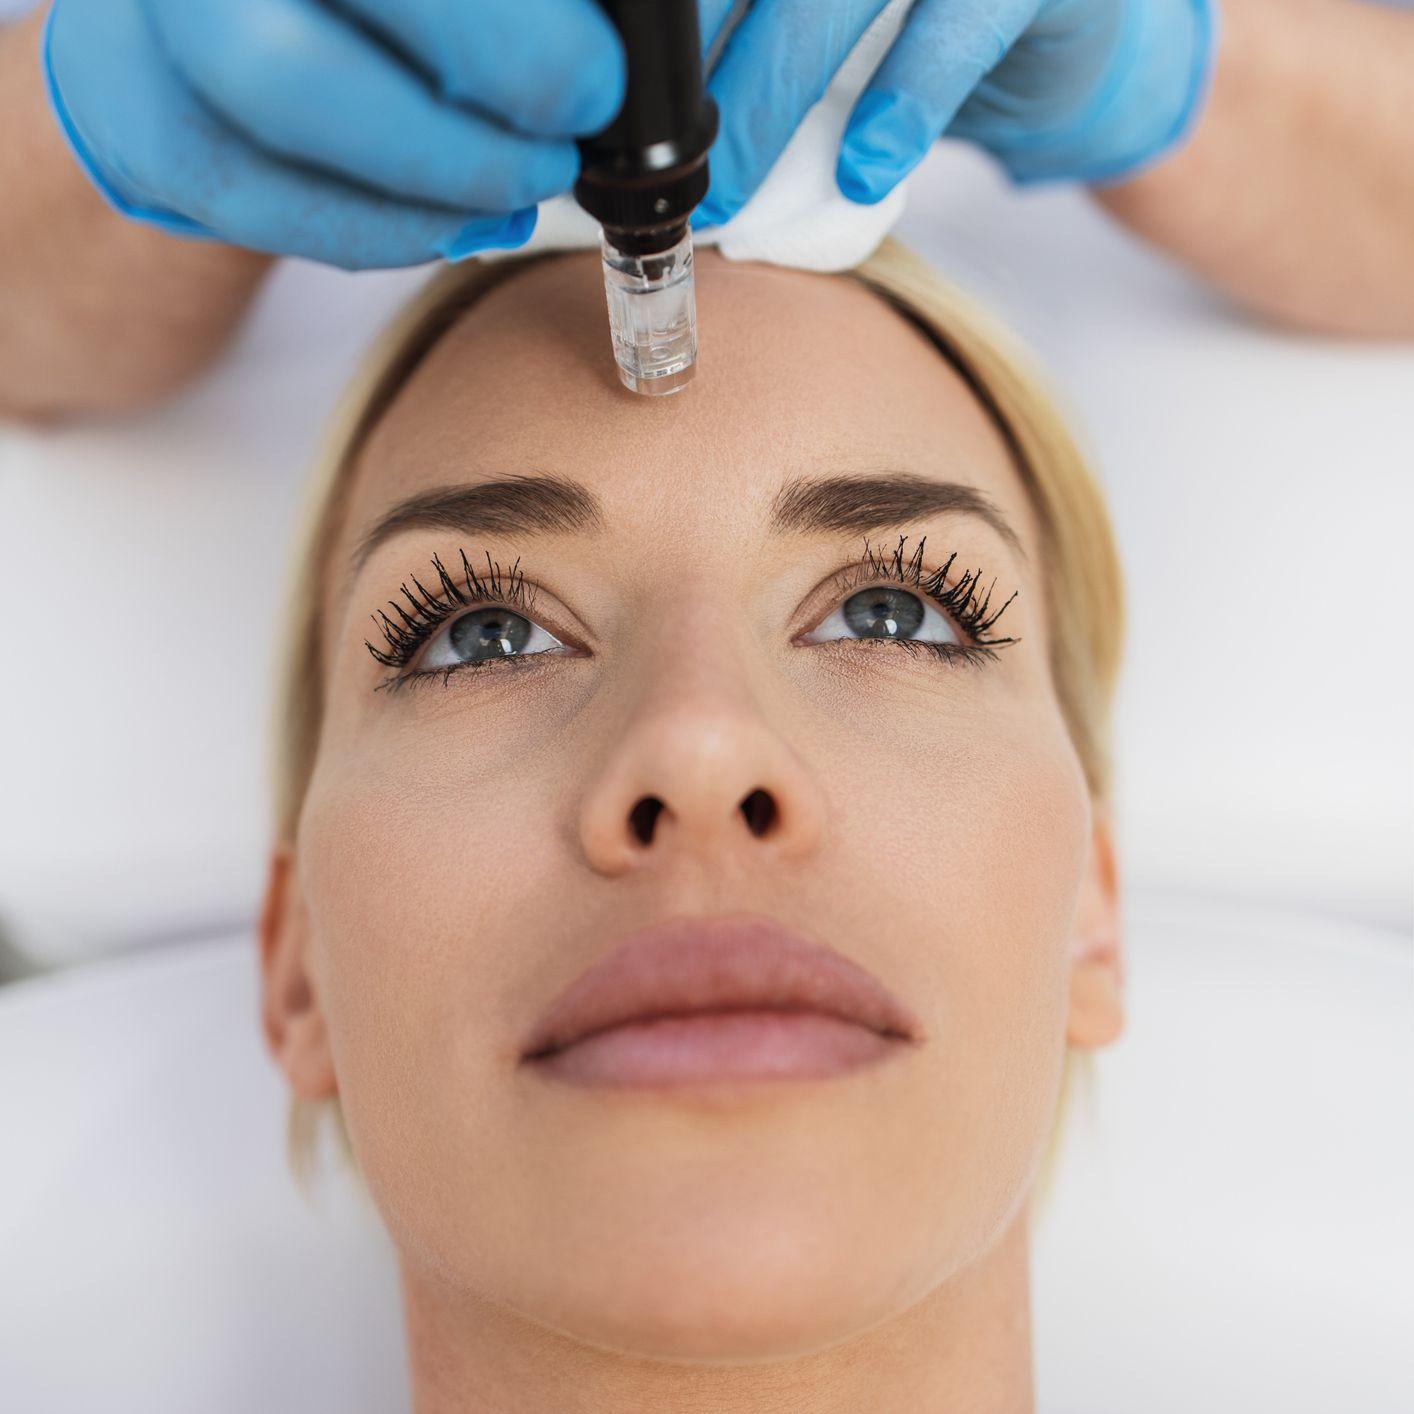 Woman receiving microneedling treatment